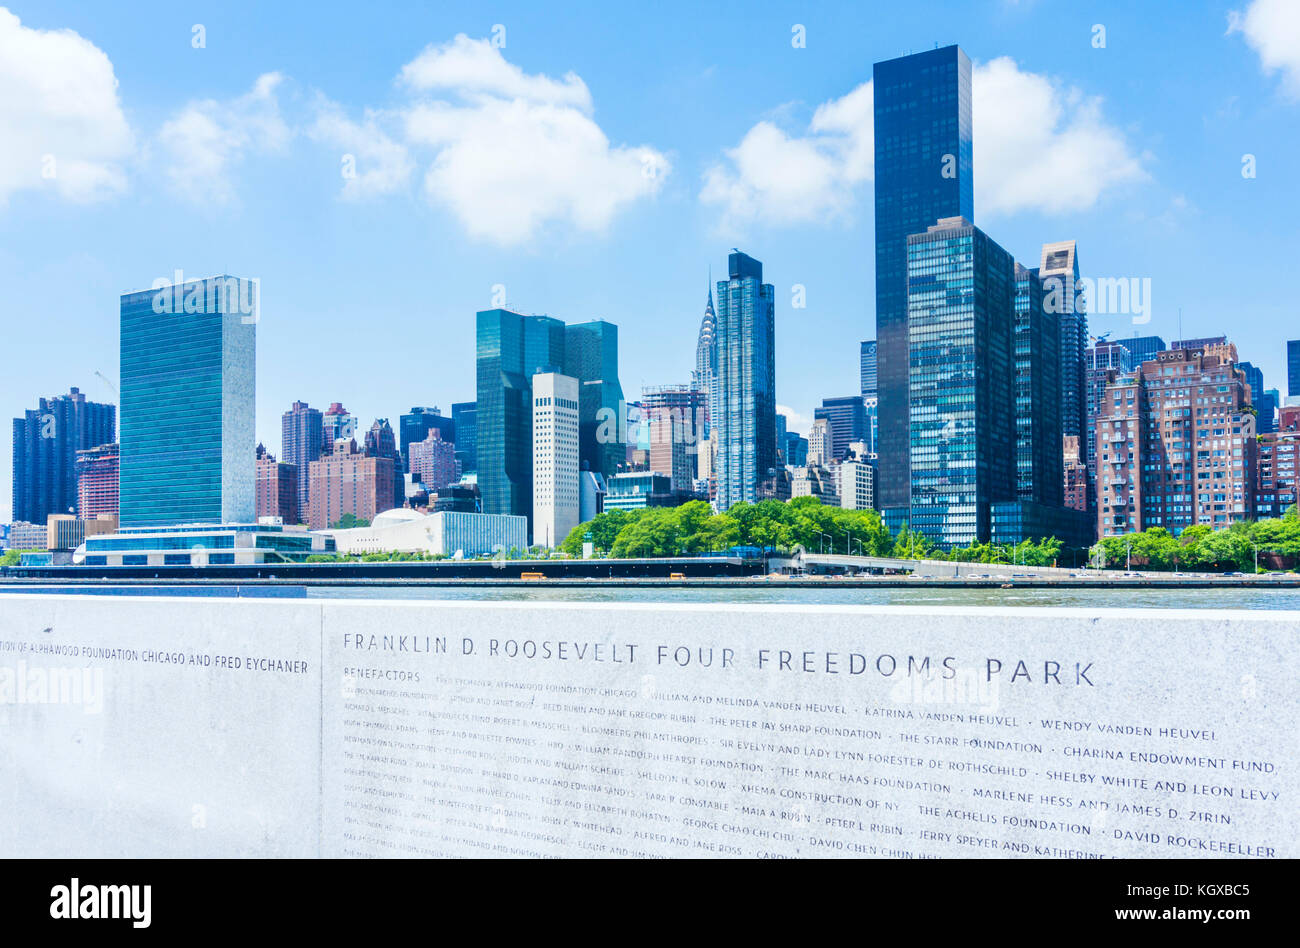 New york usa new york skyline The Franklin D. Roosevelt Four Freedoms Park Roosevelt Island Manhattan skyline manhattan - Stock Image